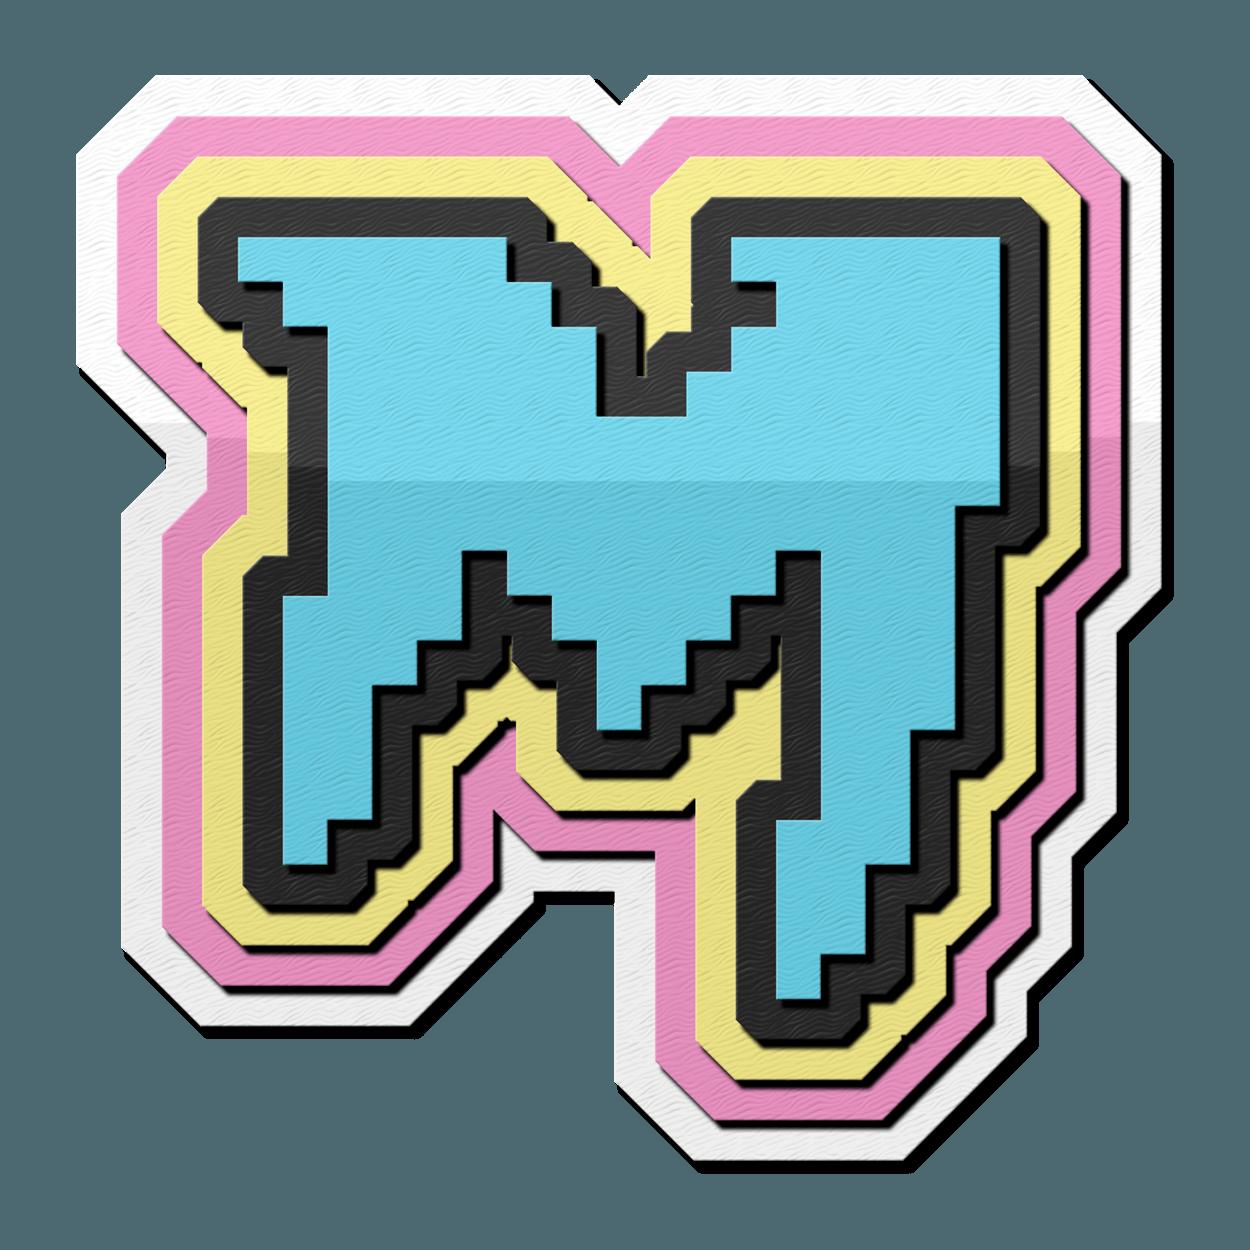 Metacutioner announces their Dota2 team